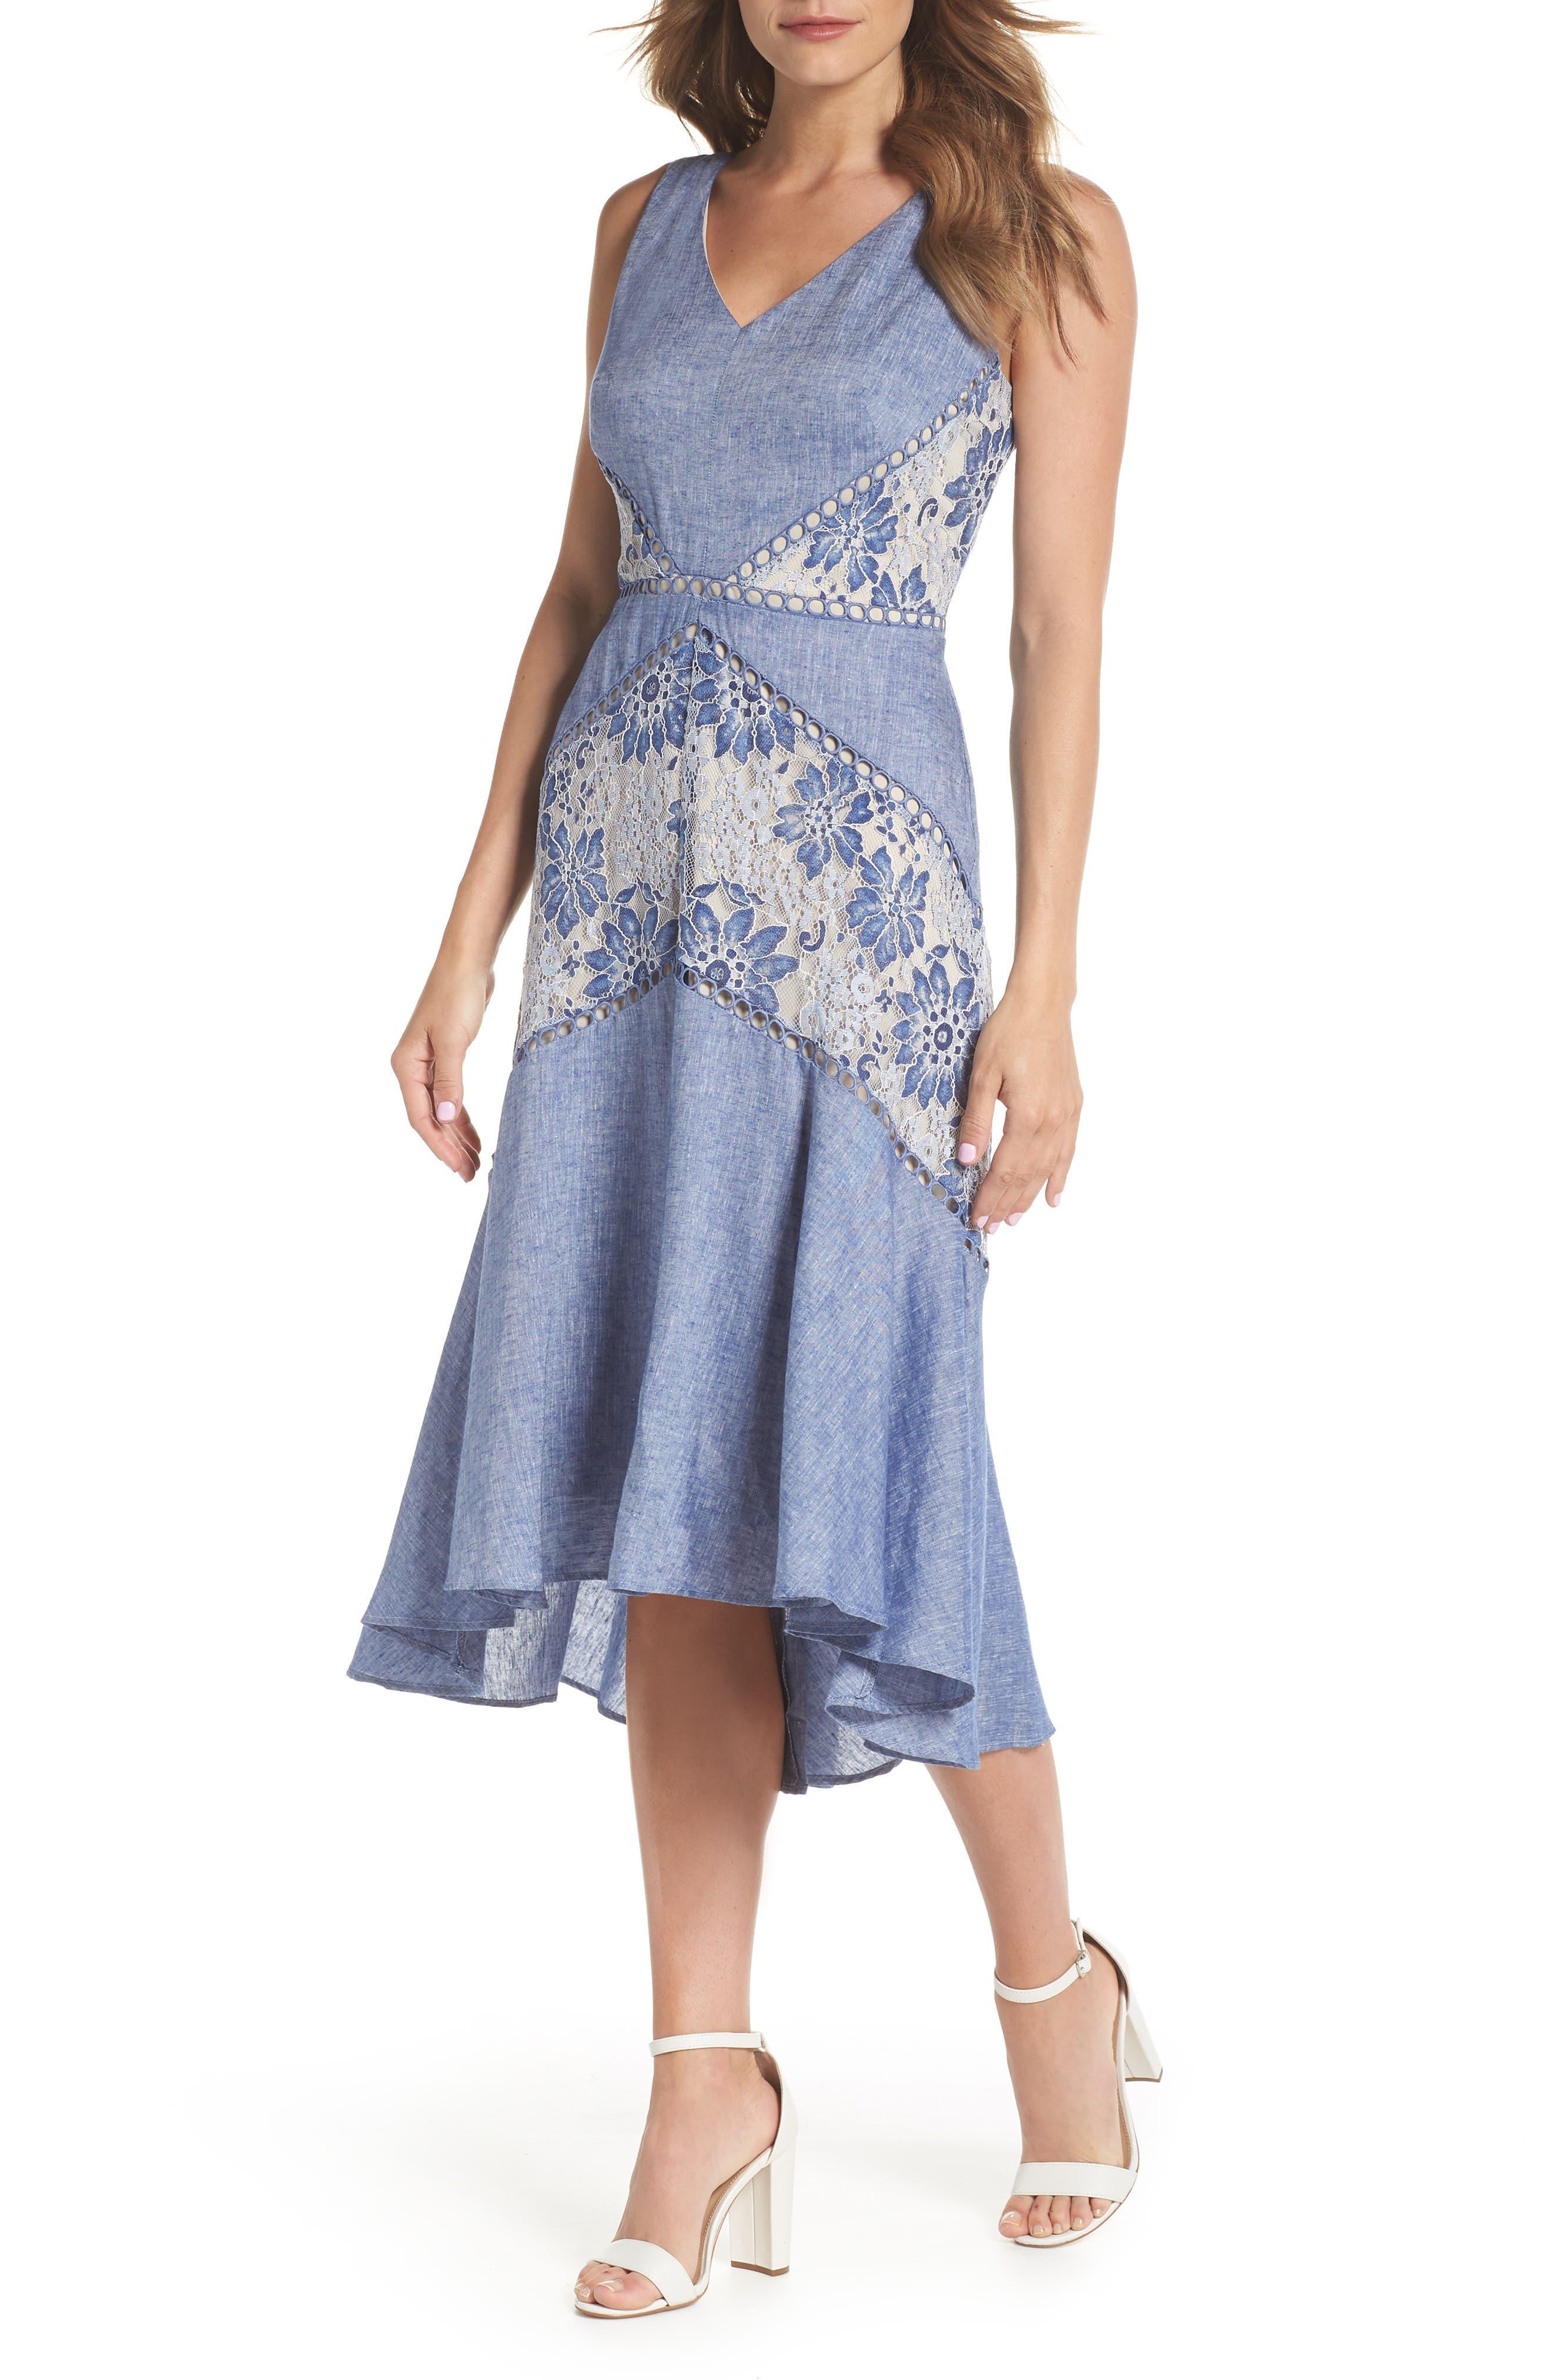 Alternate Image 1 Selected - Taylor Dresses Chambray & Lace Midi Dress